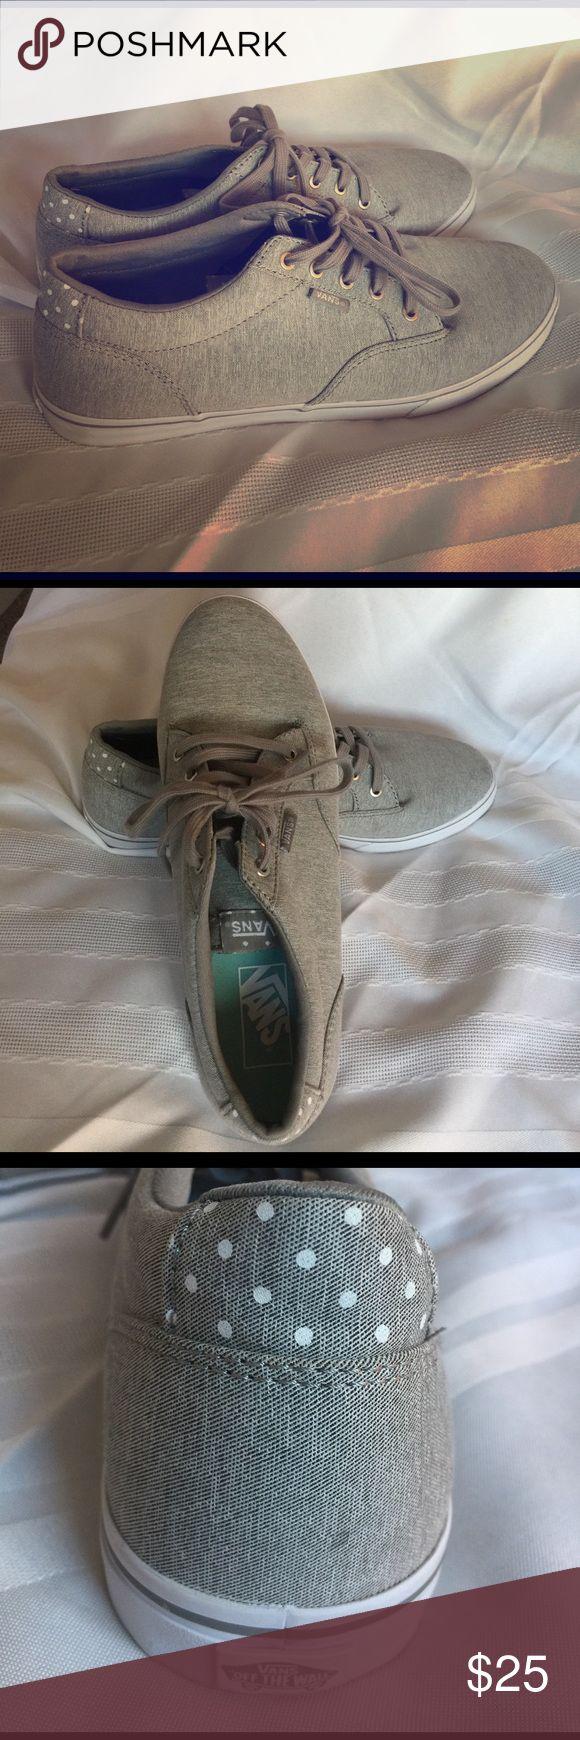 Vans Tennis Shoes Never Worn Vans Tennis Shoes. Vans Shoes Sneakers